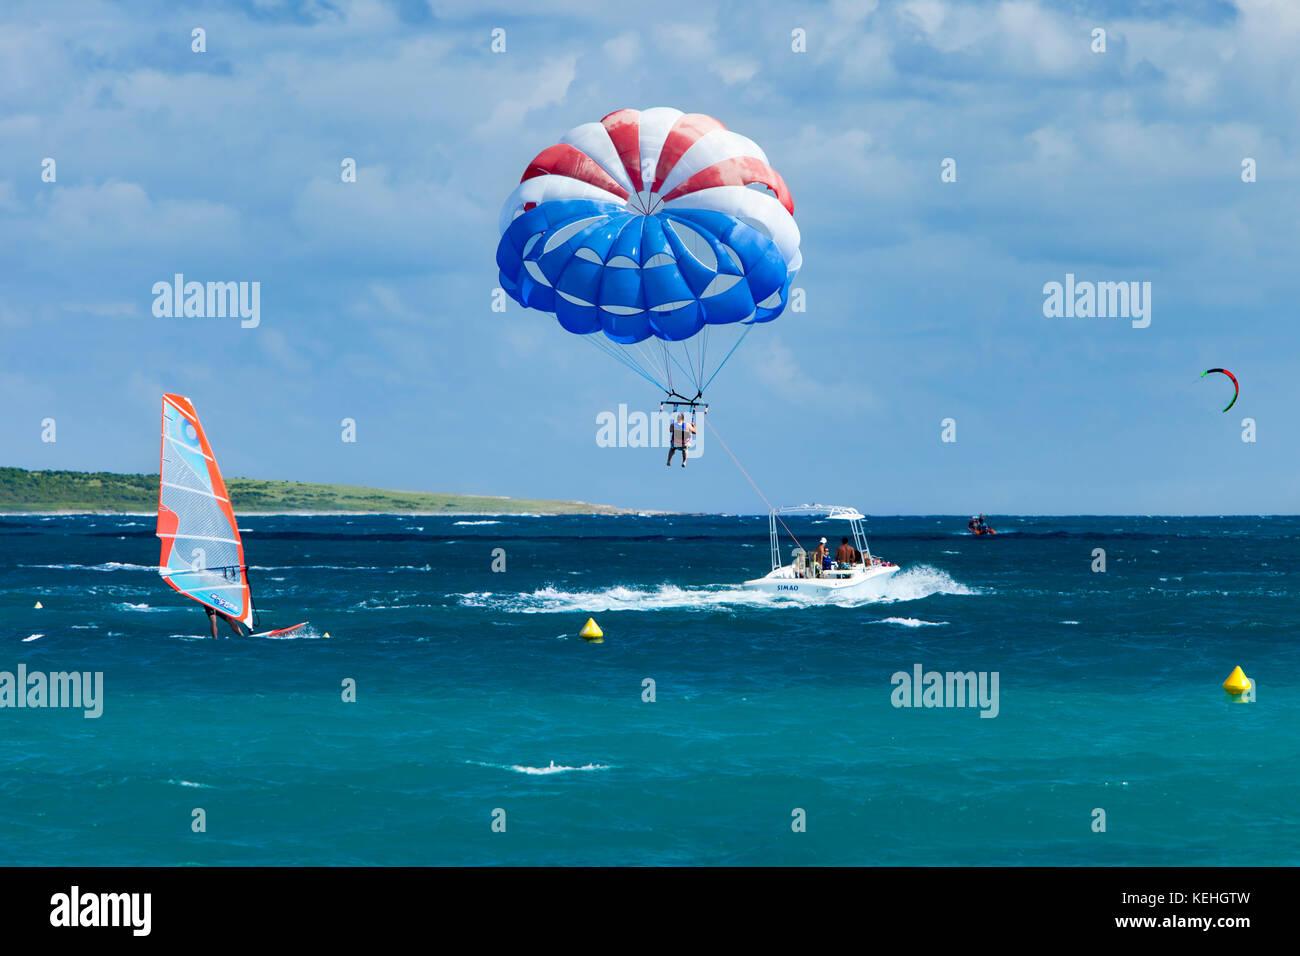 Wind Surfing, Para-Sailing, Kite-Surfing off Orient Beach, Saint Martin,  French West Indies - Stock Image